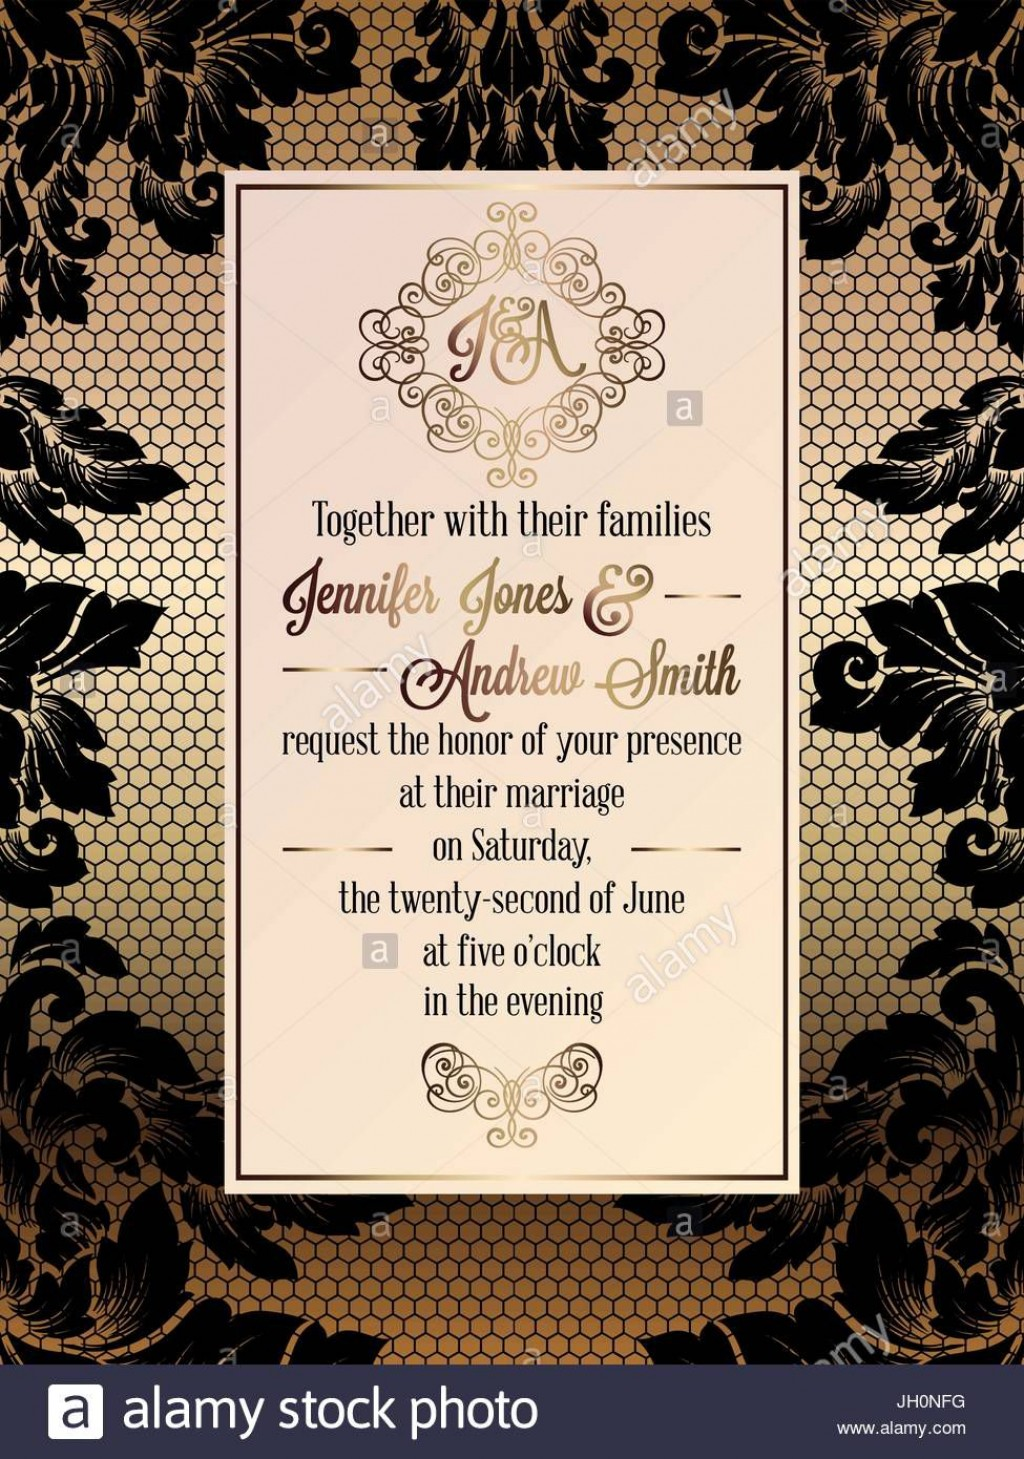 008 Impressive Elegant Wedding Menu Card Template Highest Quality  TemplatesLarge